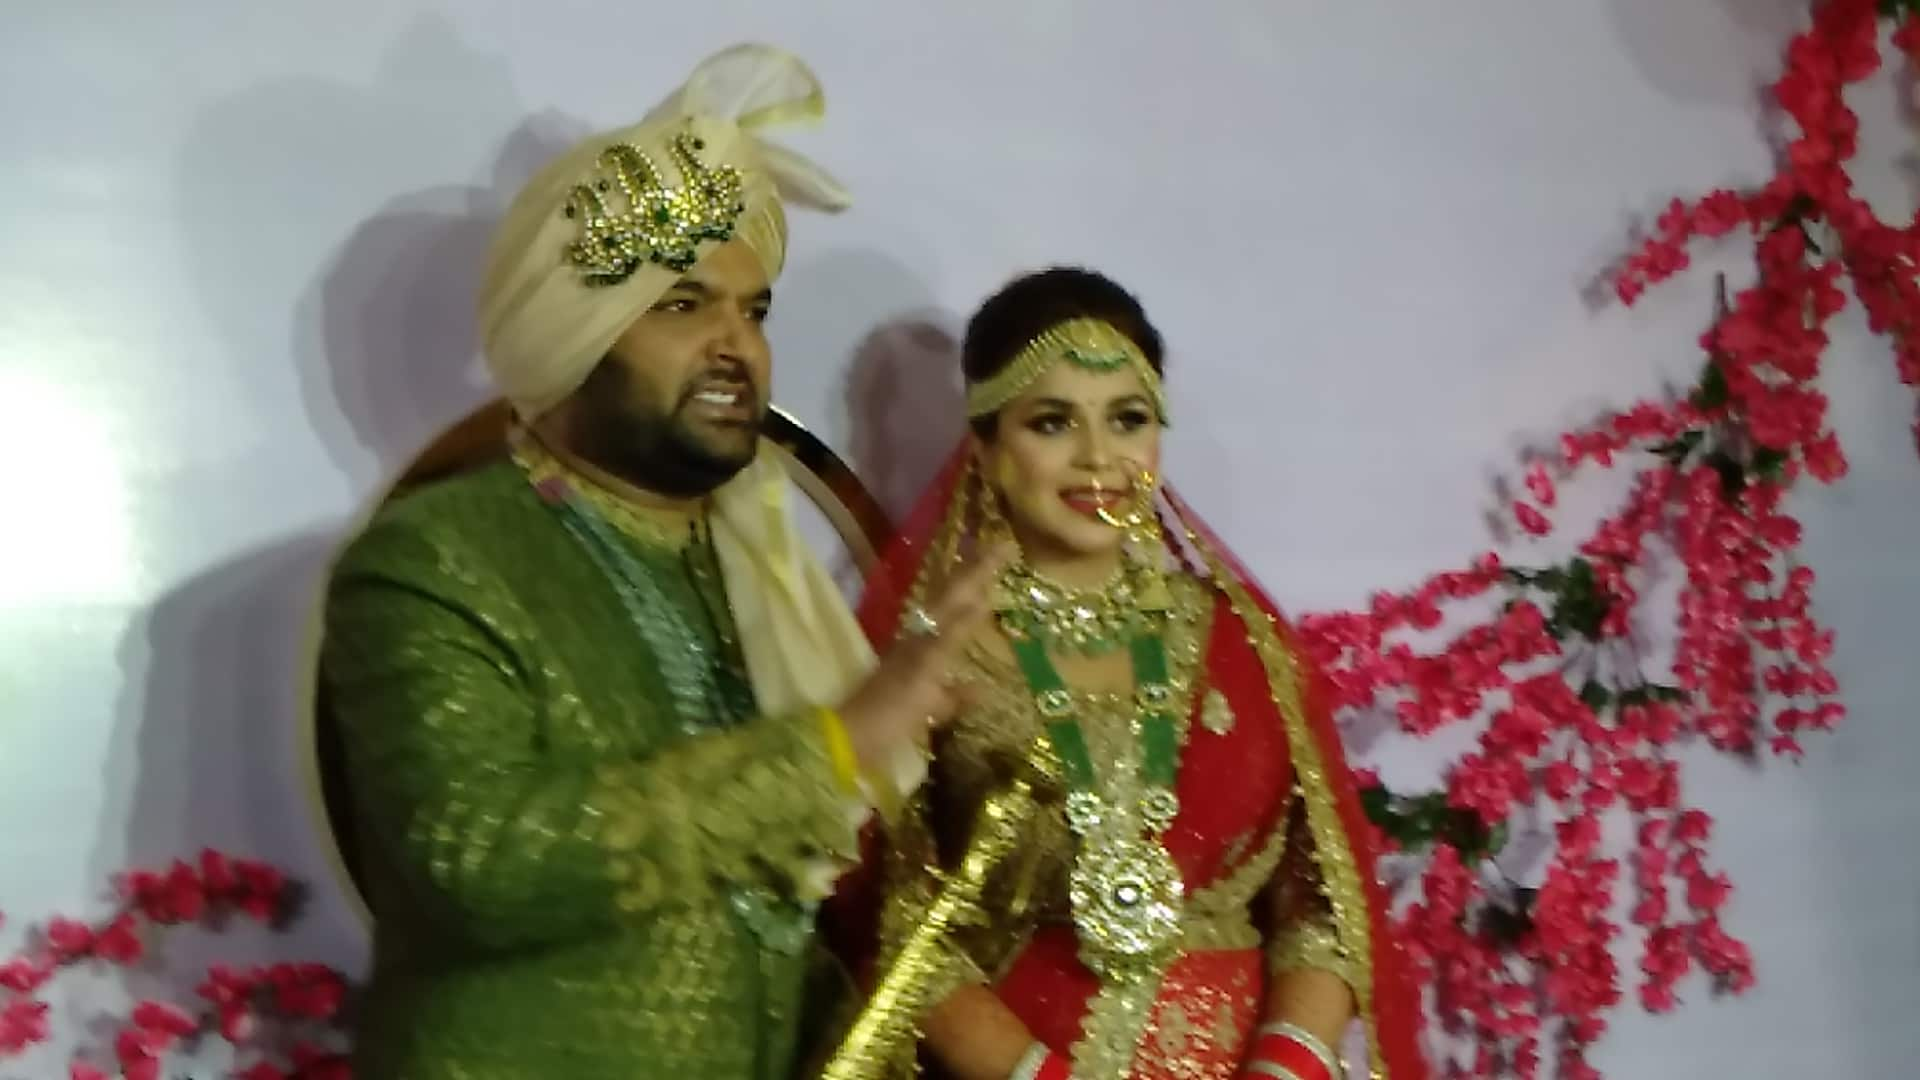 Bollywood Tadka, कपिल शर्मा इमेज, गिन्नी चतरथ इमेज,शादी